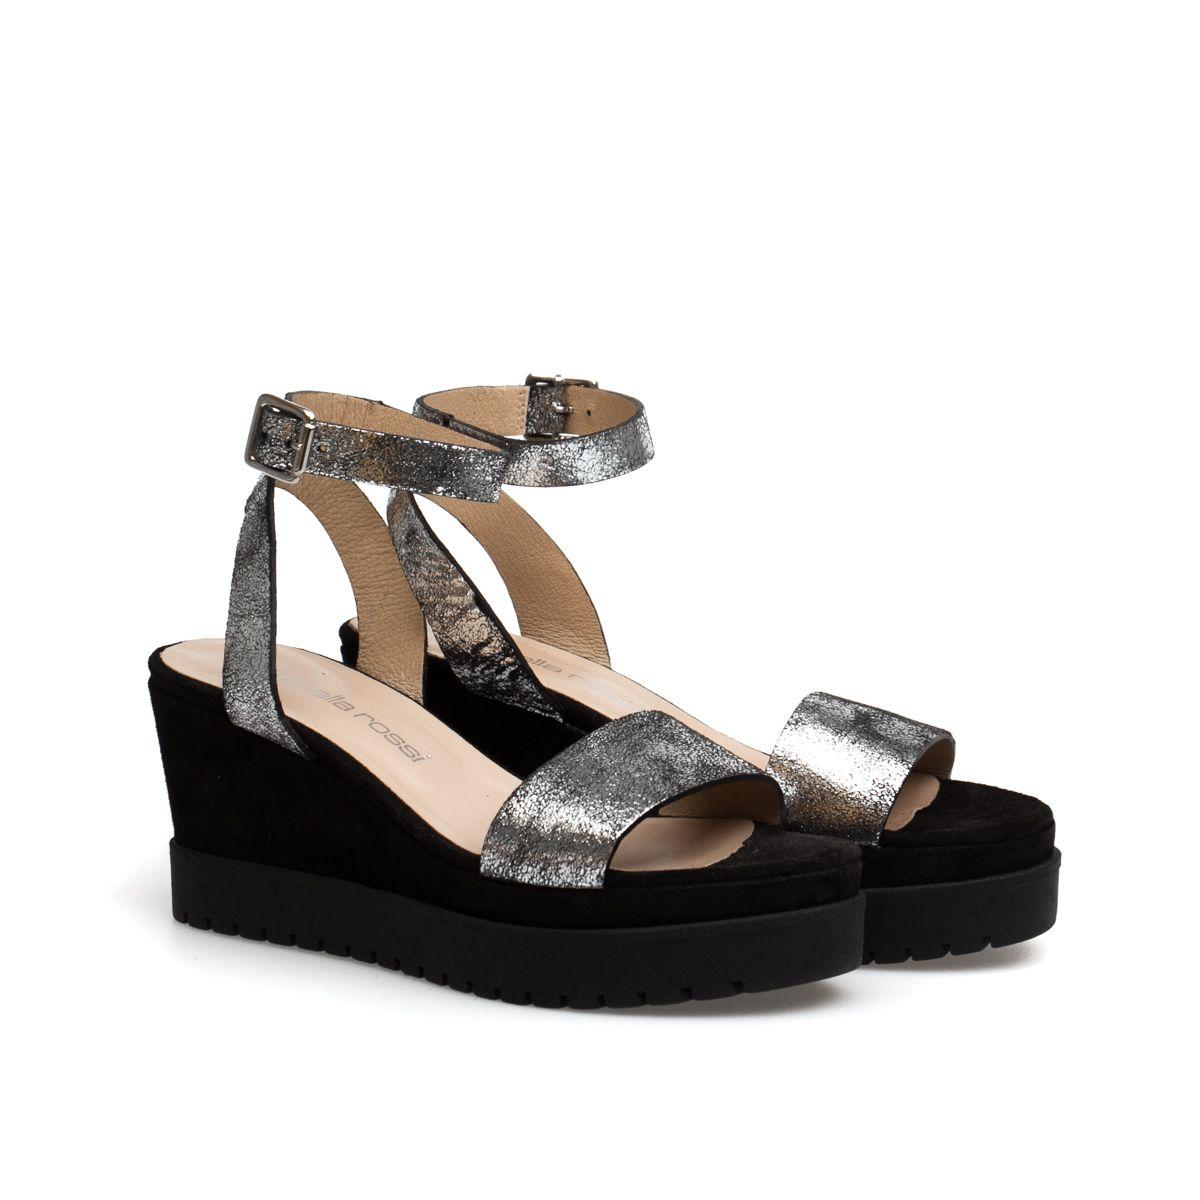 Antonella Rossi ženske sandale platforma -  arzen924r-supup-cdf-cronero-zenska-